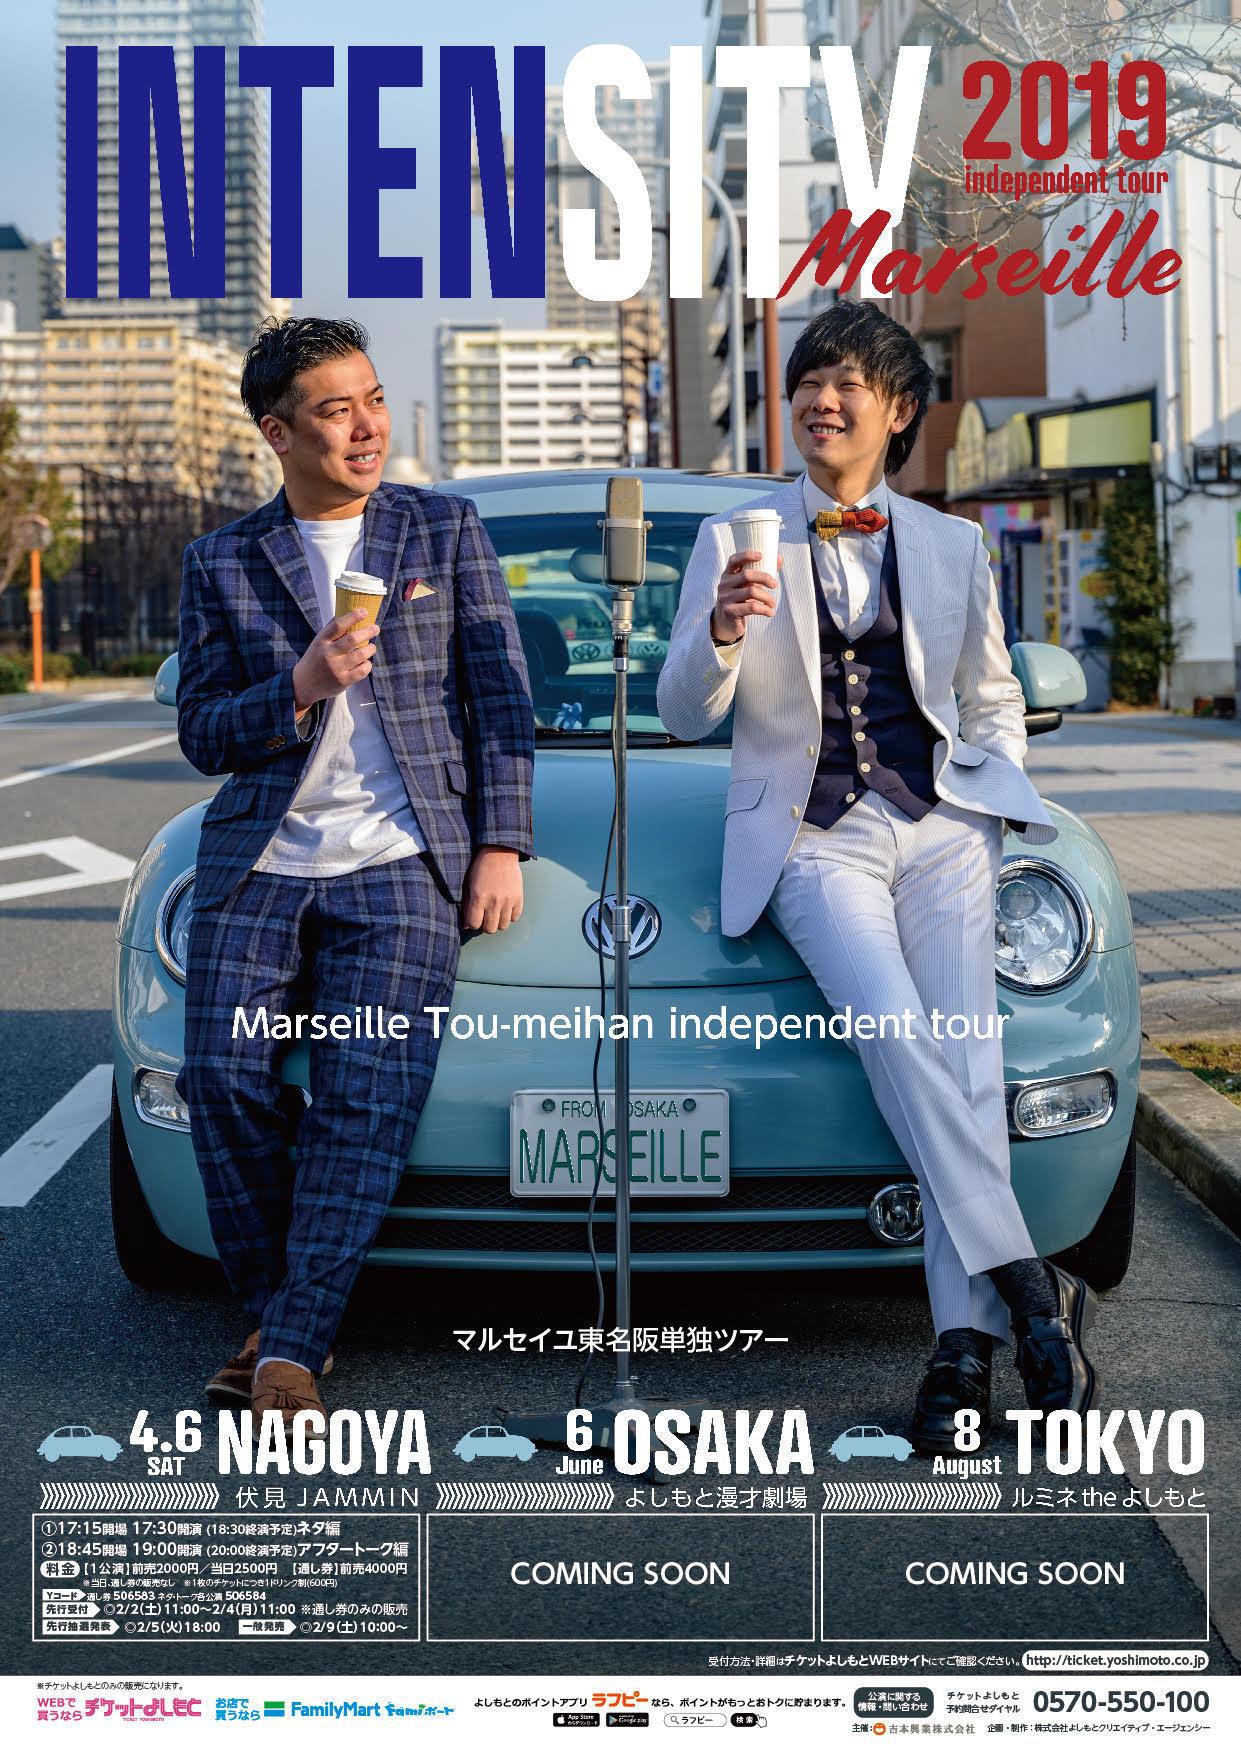 http://news.yoshimoto.co.jp/20190201192243-179ce7b90b1fb40c31410145e4e718a8164388c6.jpg